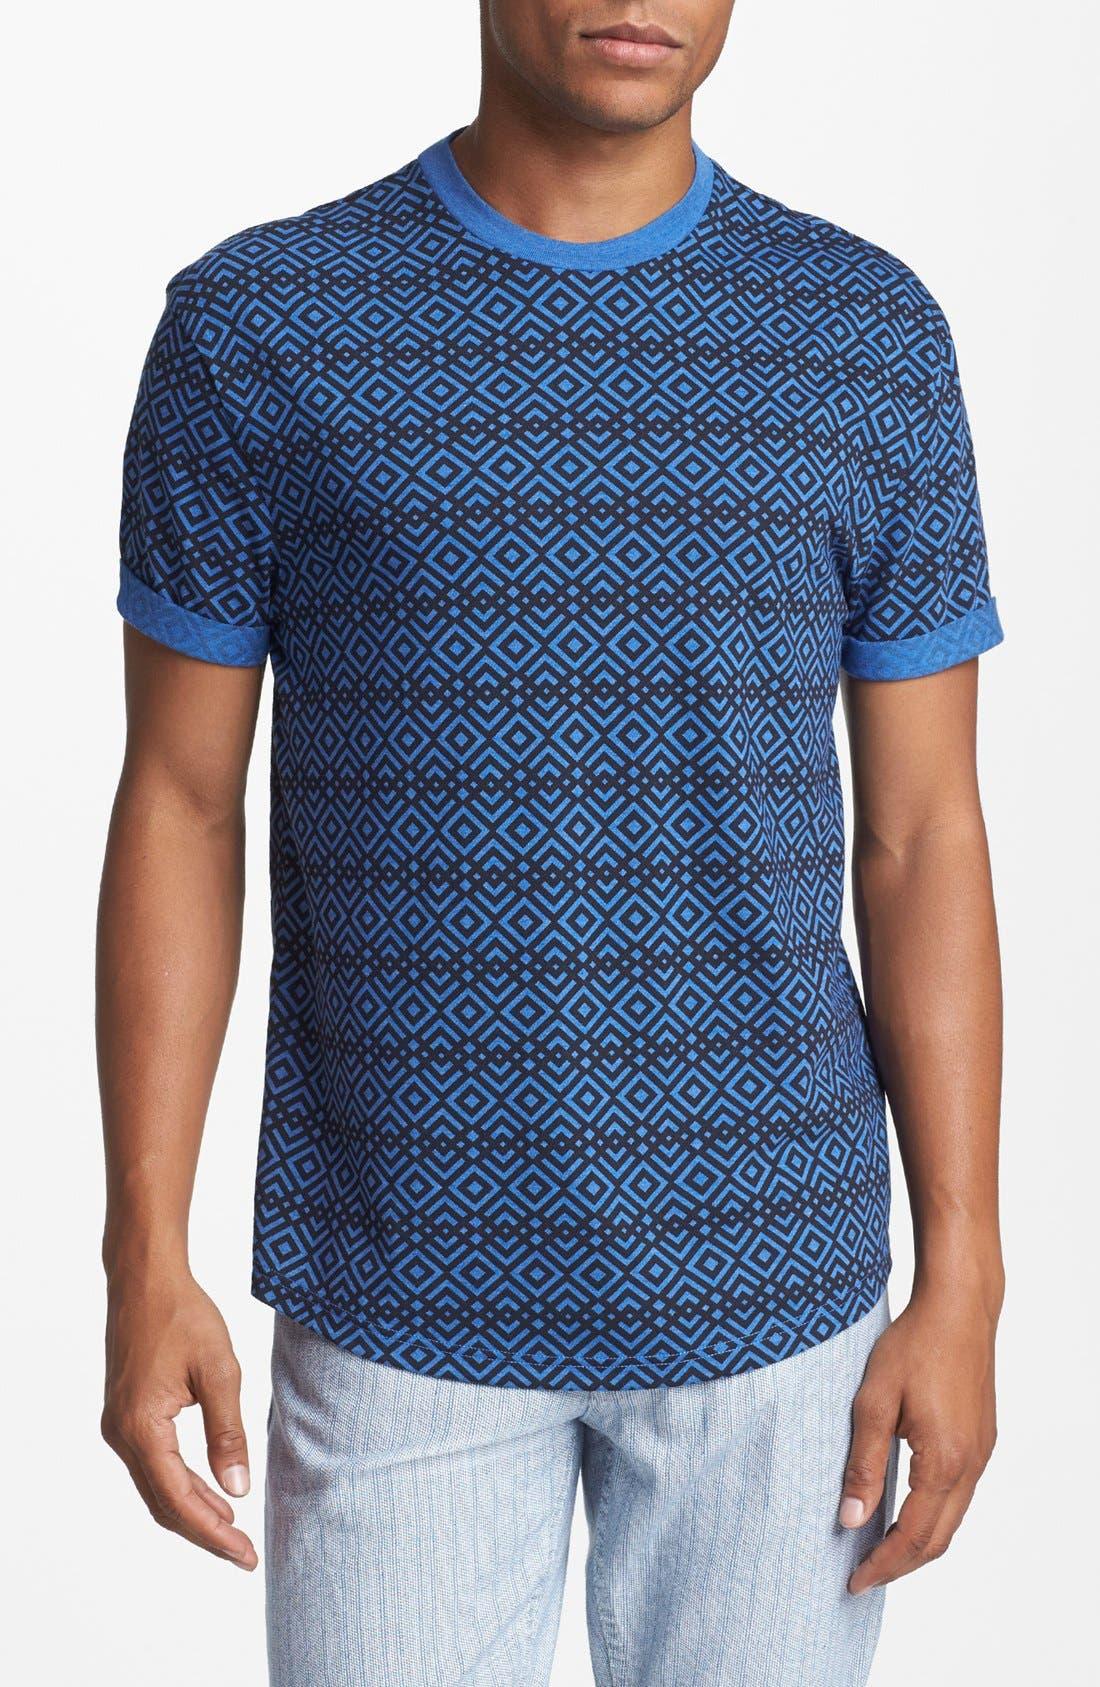 Alternate Image 1 Selected - Topman Crisscross Print T-Shirt